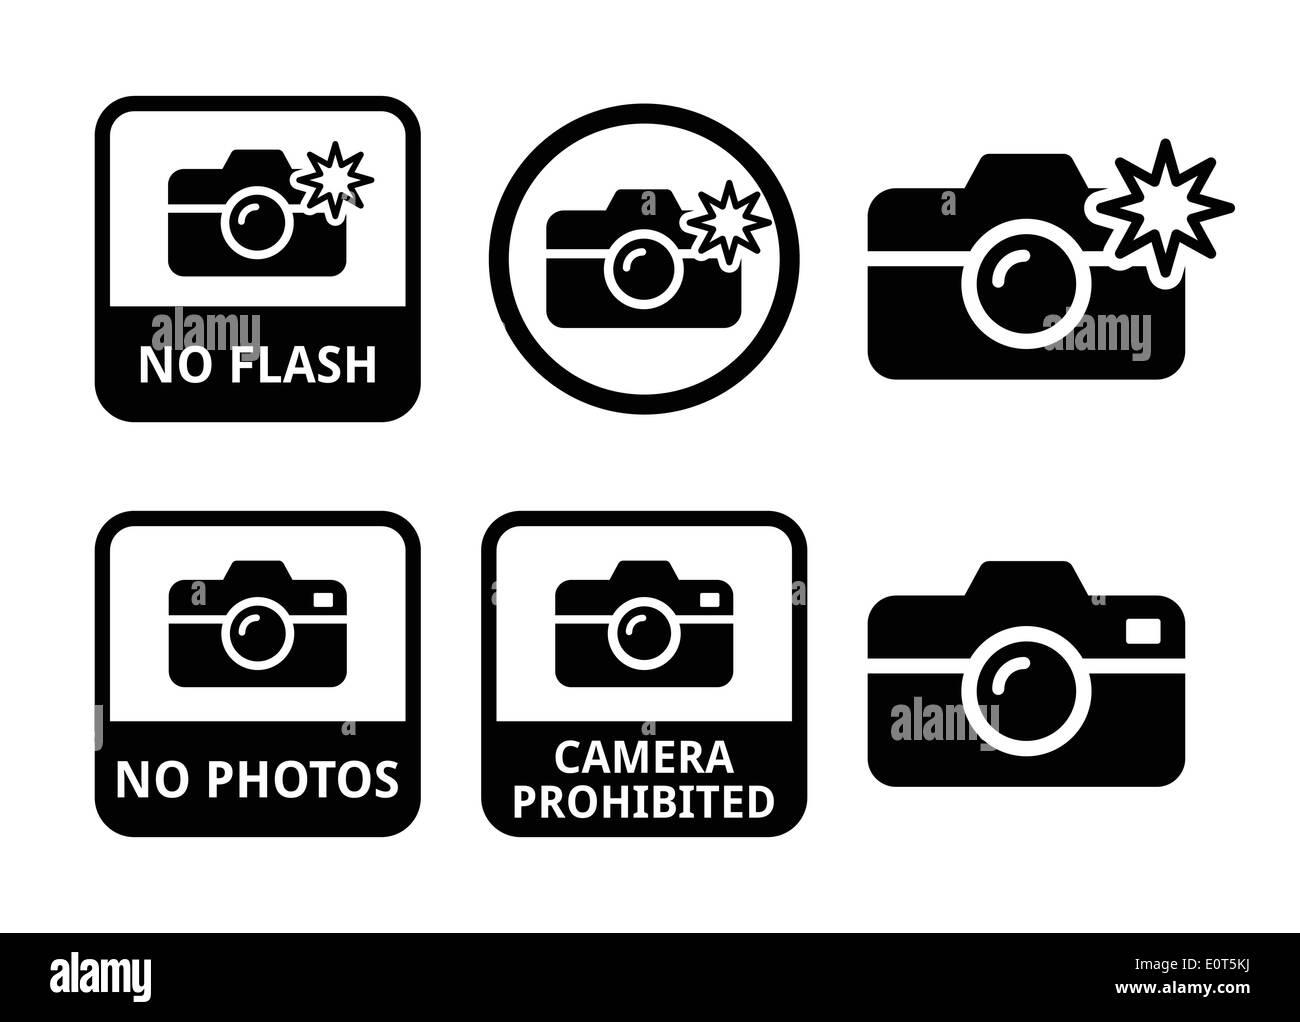 No photos, no cameras, no flash icons - Stock Image